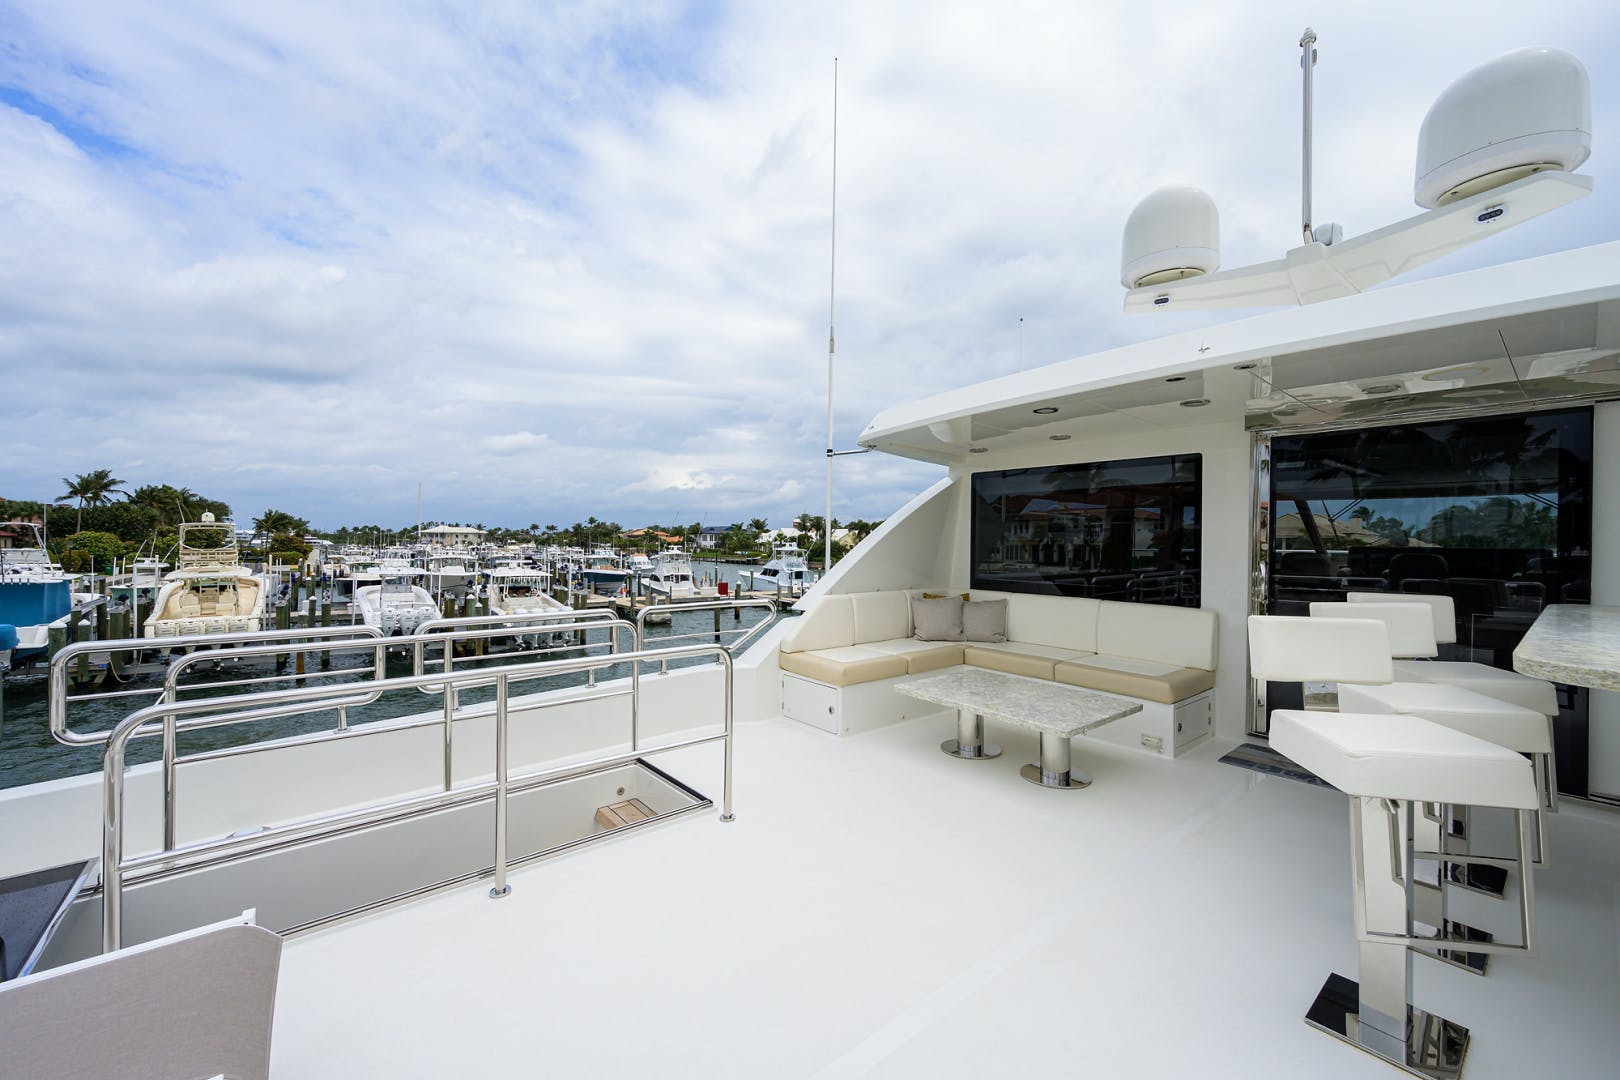 2019 Ocean Alexander 100' Motor Yacht Seasons in the Sun | Picture 6 of 39